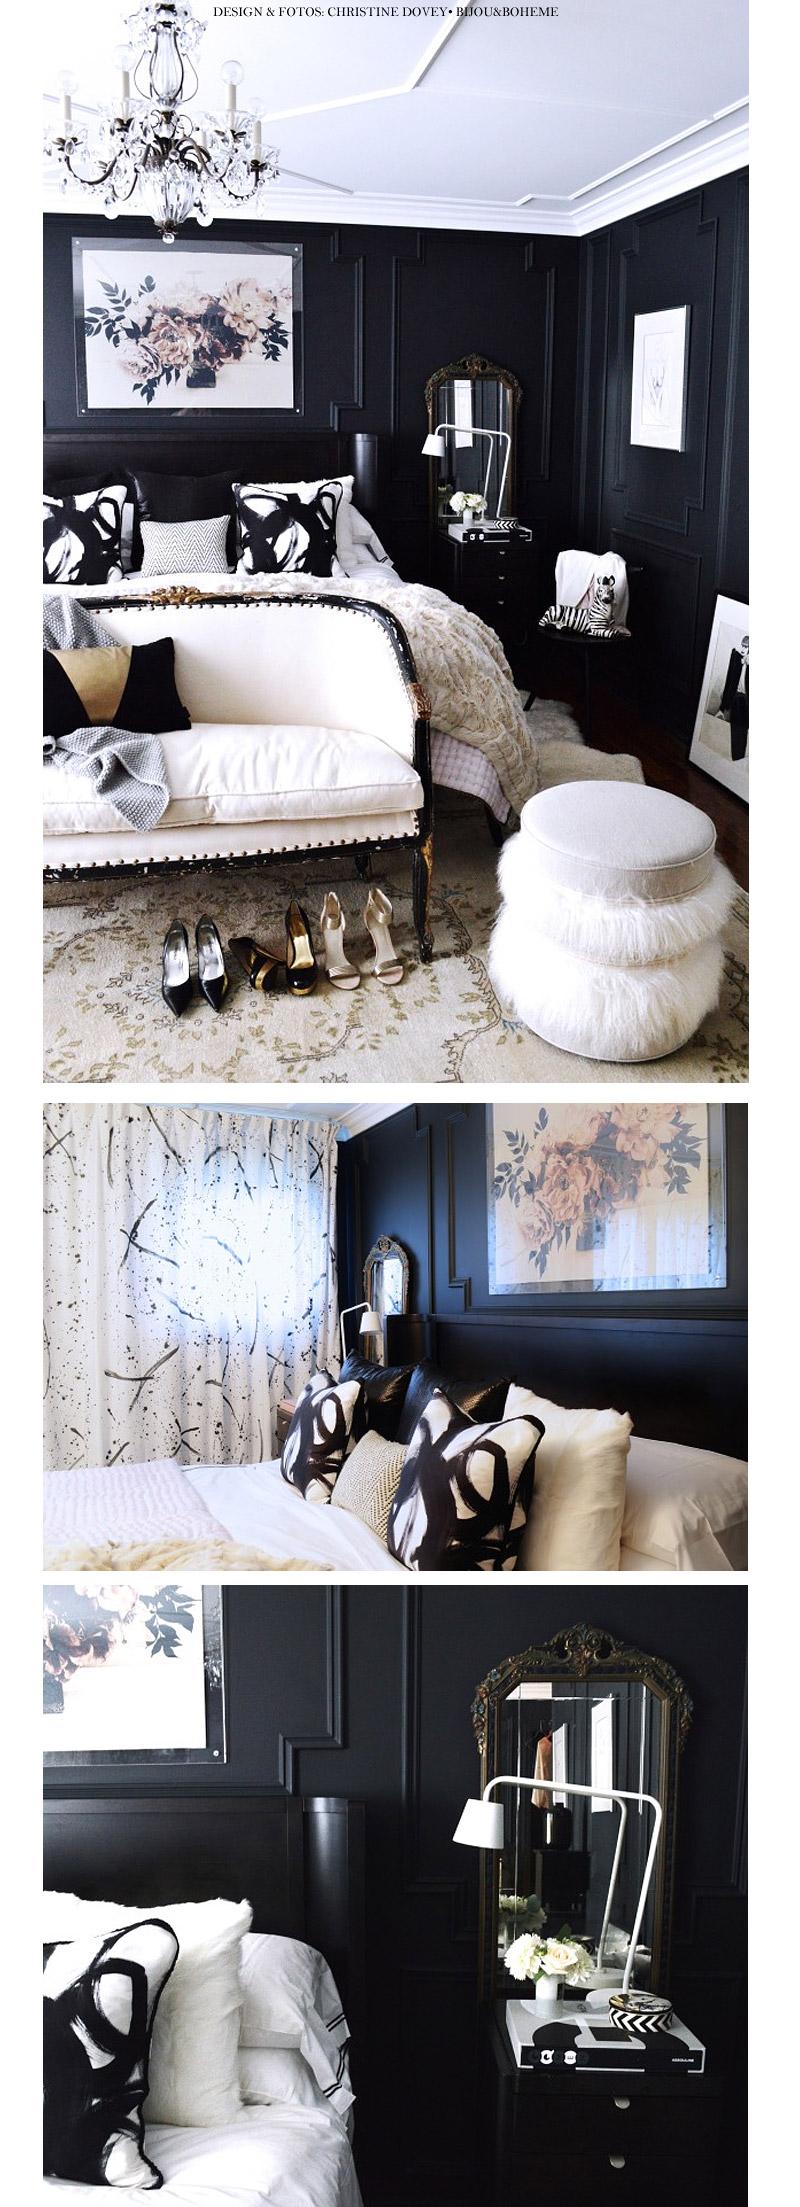 living-gazette-barbara-resende-decor-quarto-classico-preto-branco-bijou-boheme